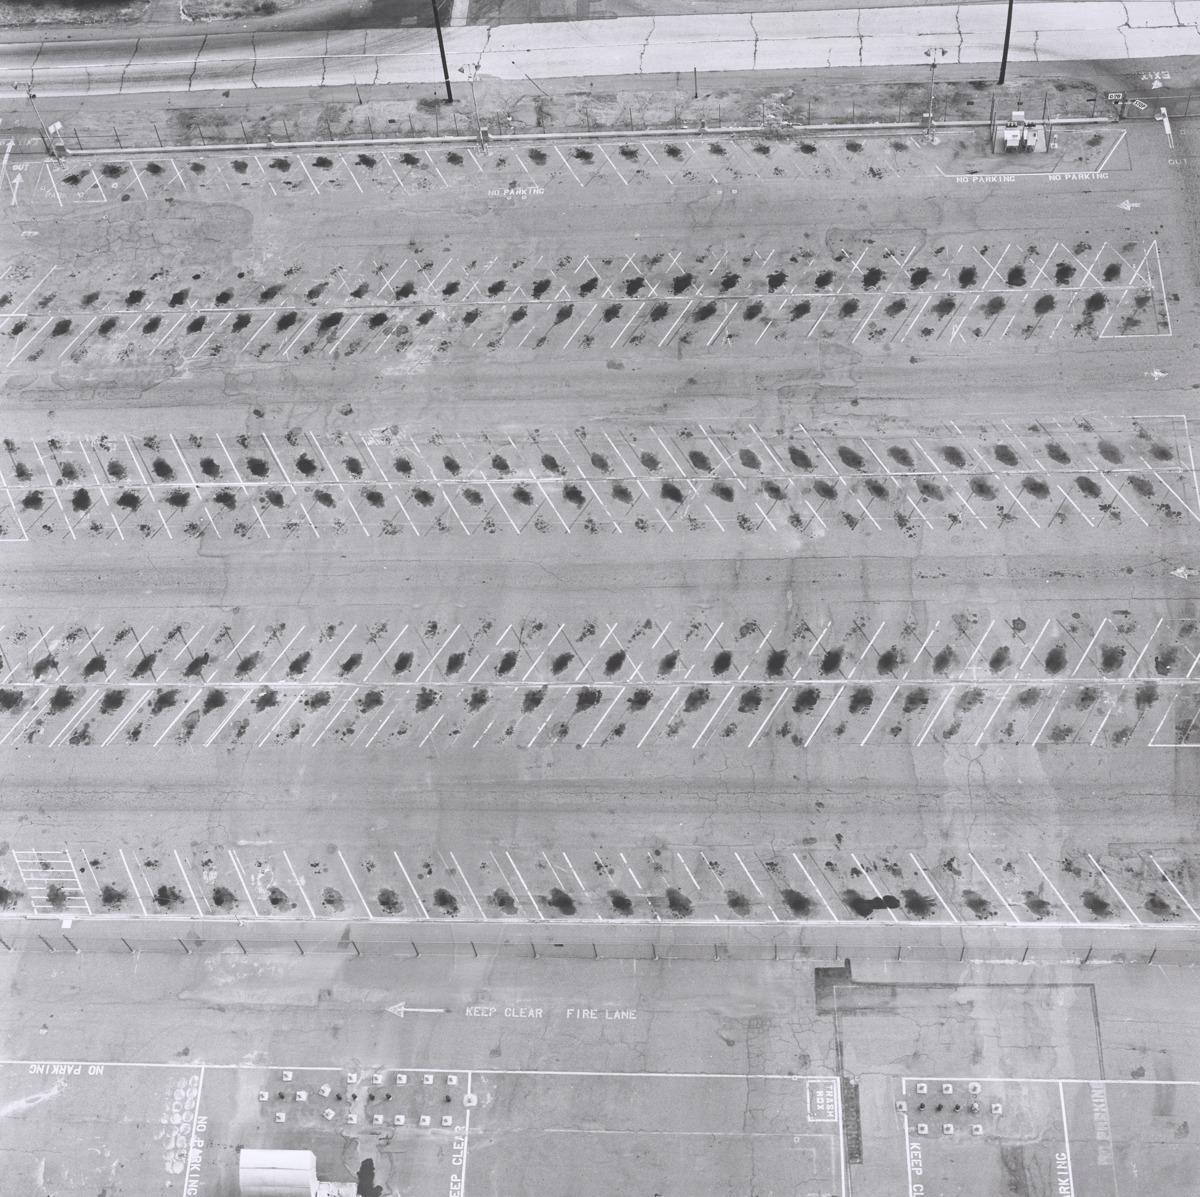 Lockheed Air Terminal, 2627 N. Hollywood Way, Burbank (large view)